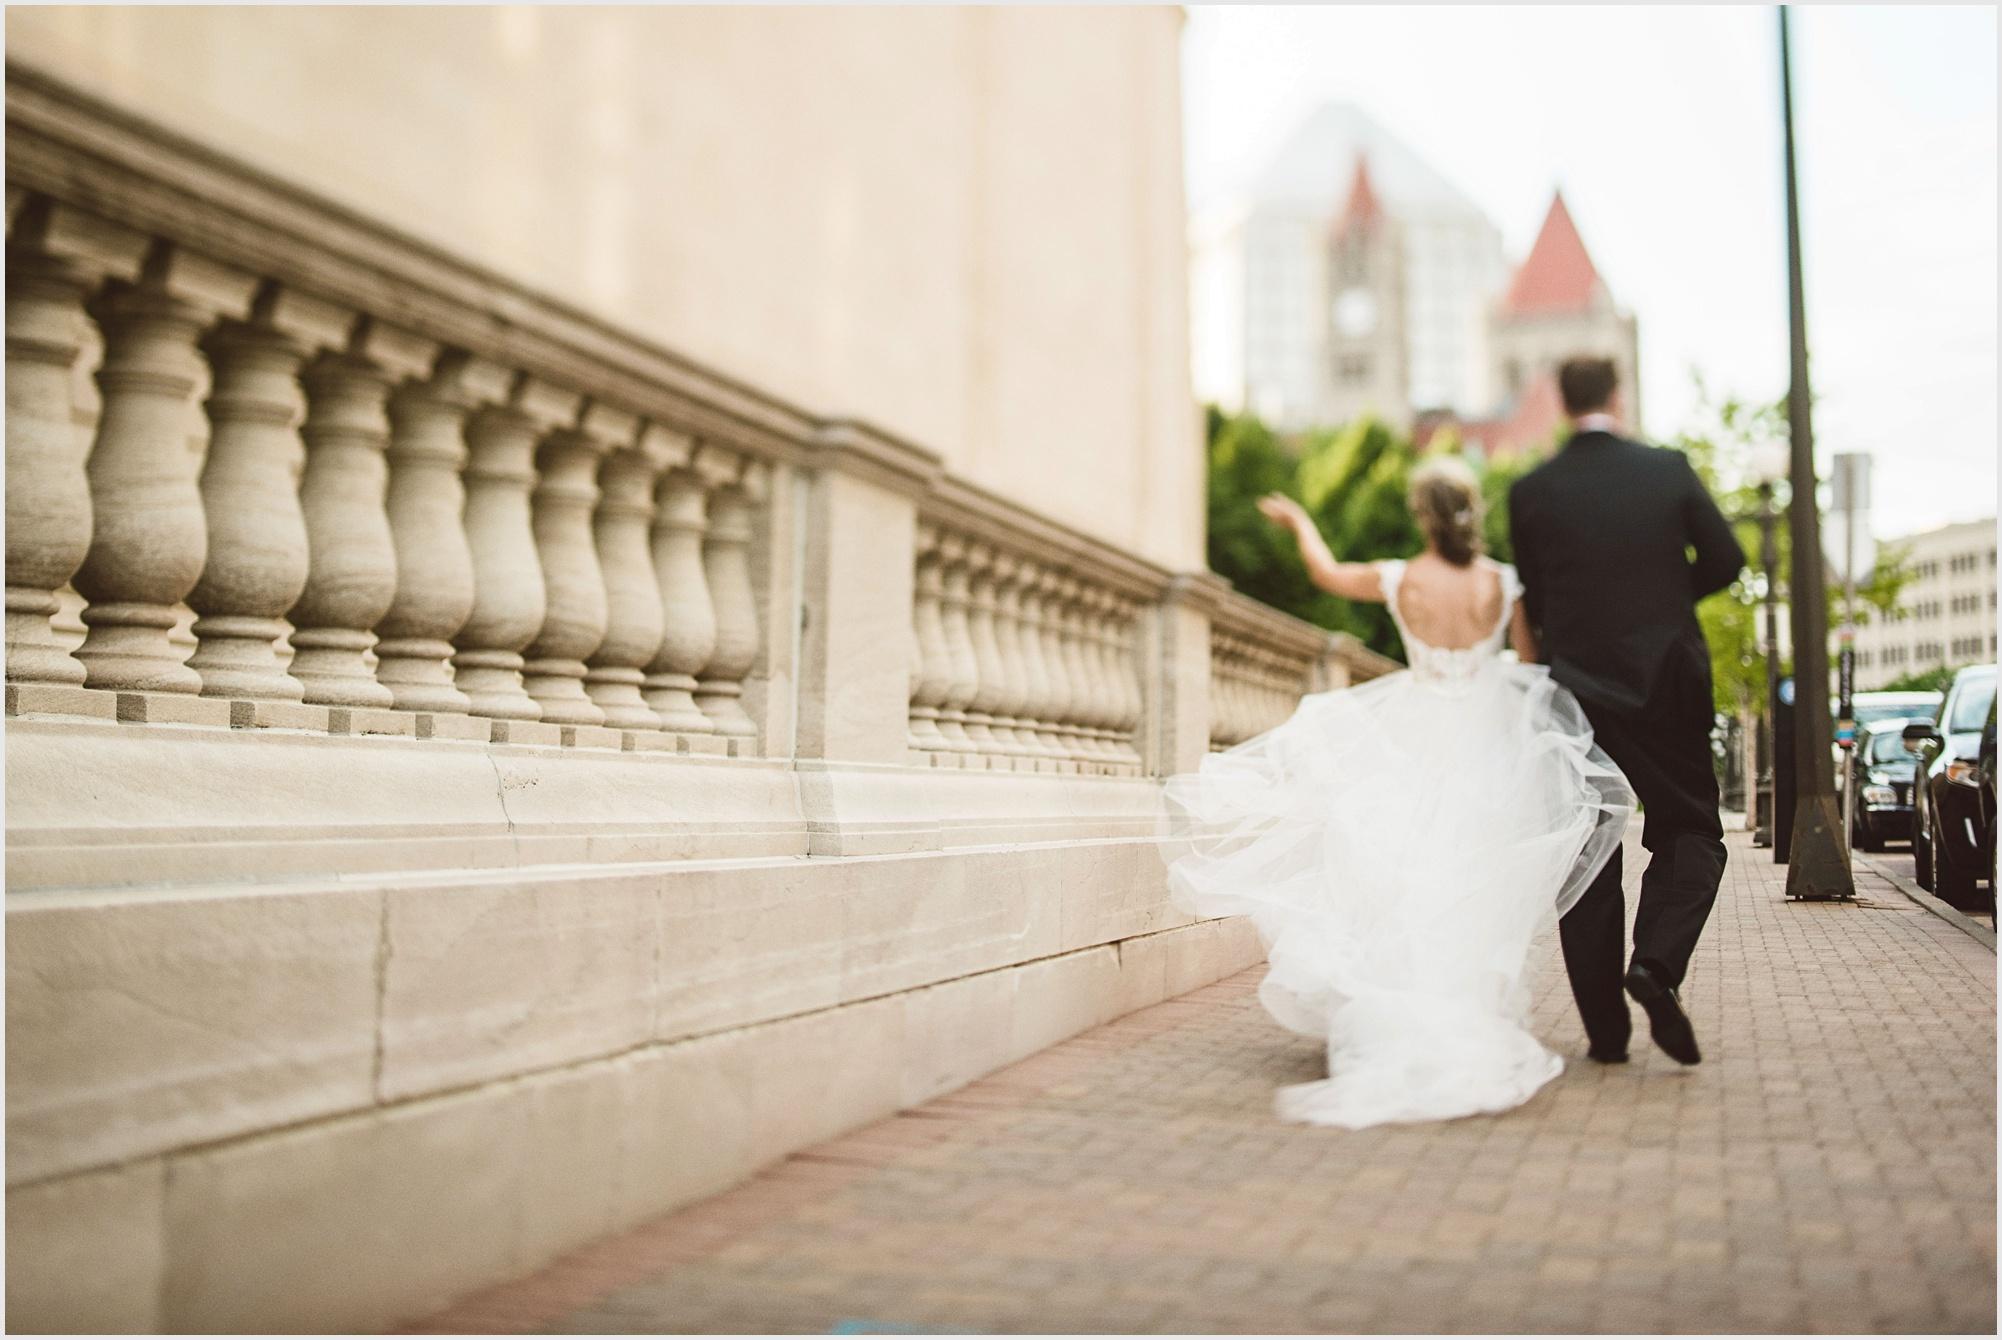 maura_david_james_j_hill_wedding_lucas_botz_photography_050.jpg